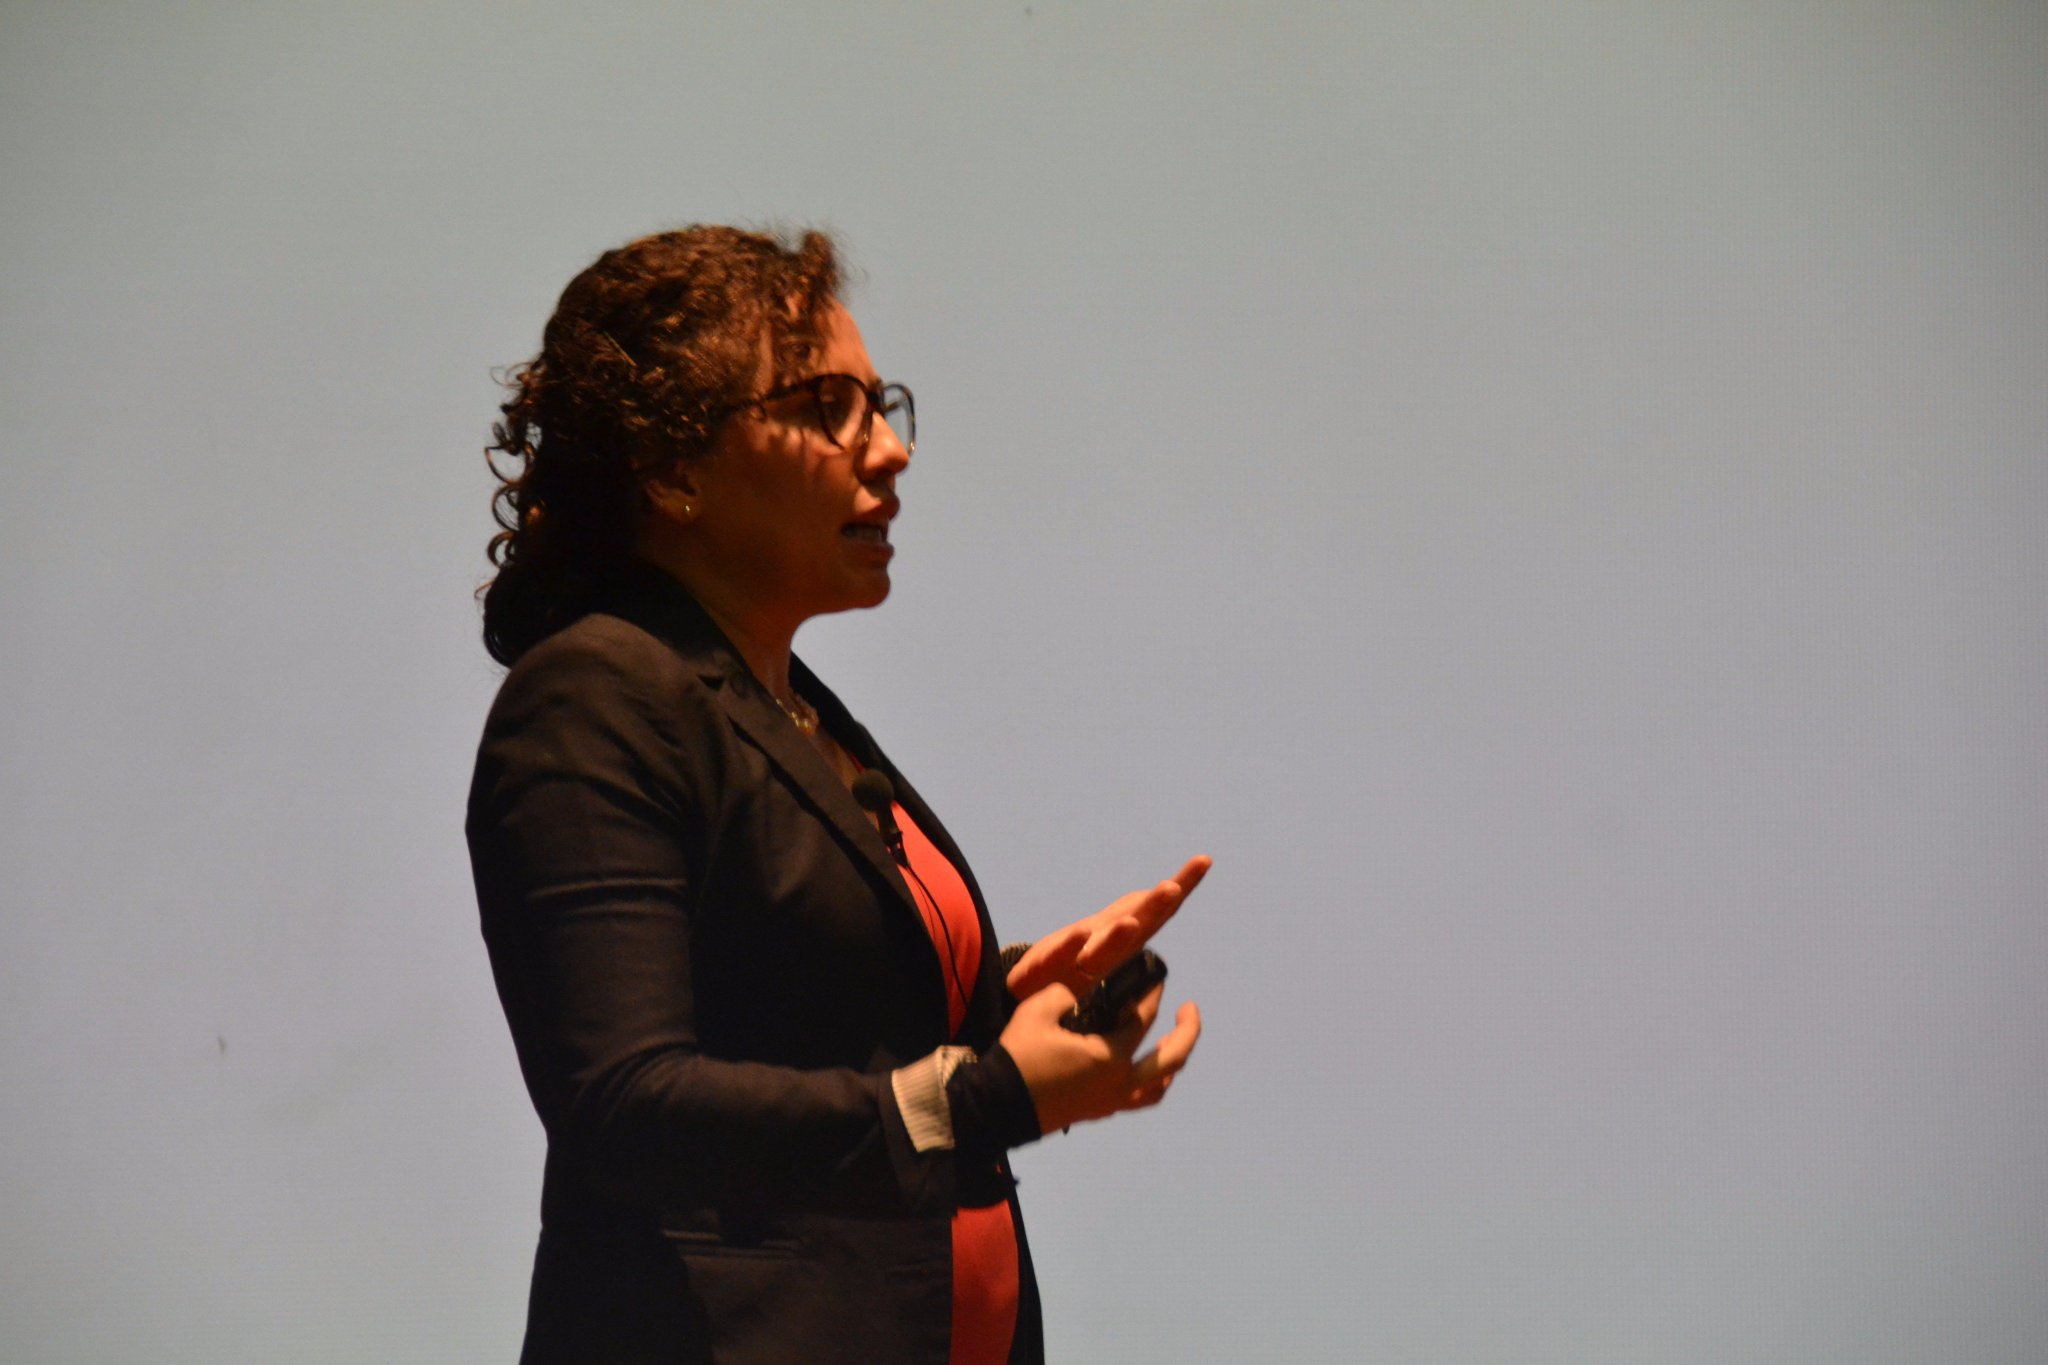 Interviene Andrea Herrera, profesora de la @Utadeo_edu_co Panel #EconomíaCircular Simposio #CrecimientoVerde: https://t.co/1pnwASUUMV https://t.co/dwnsGZs0MH